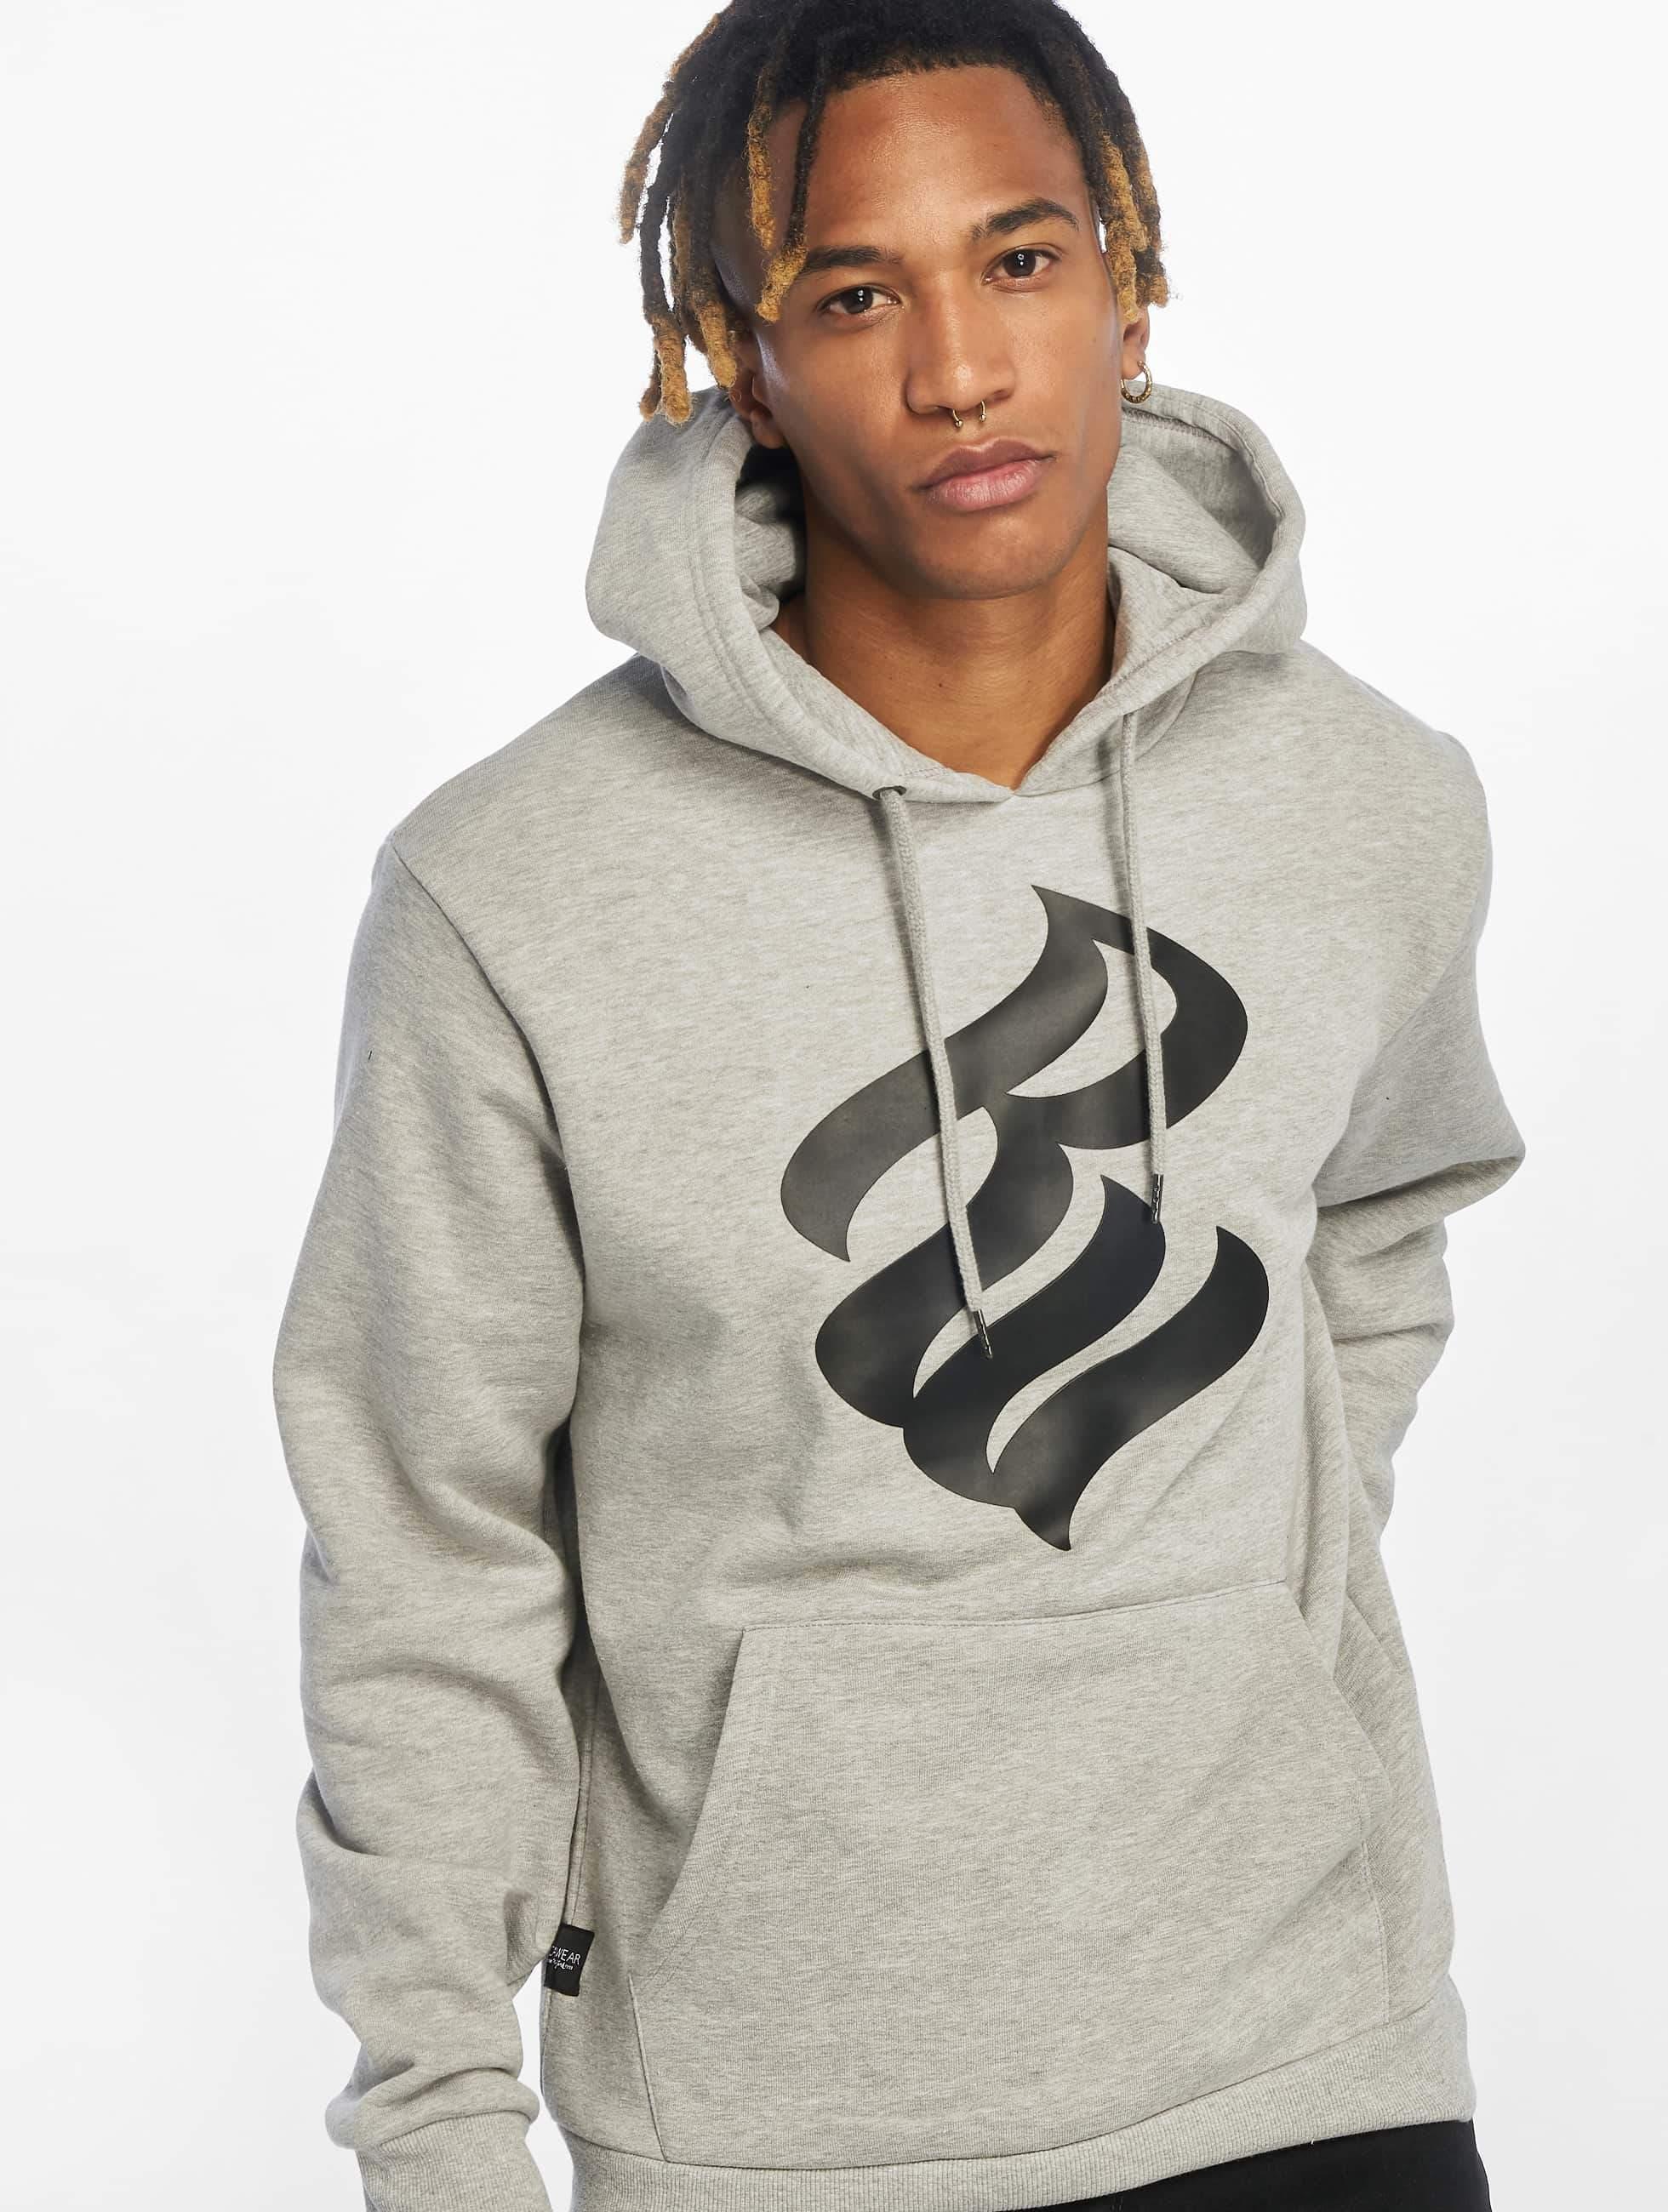 Rocawear / Hoodie Basic in grey S